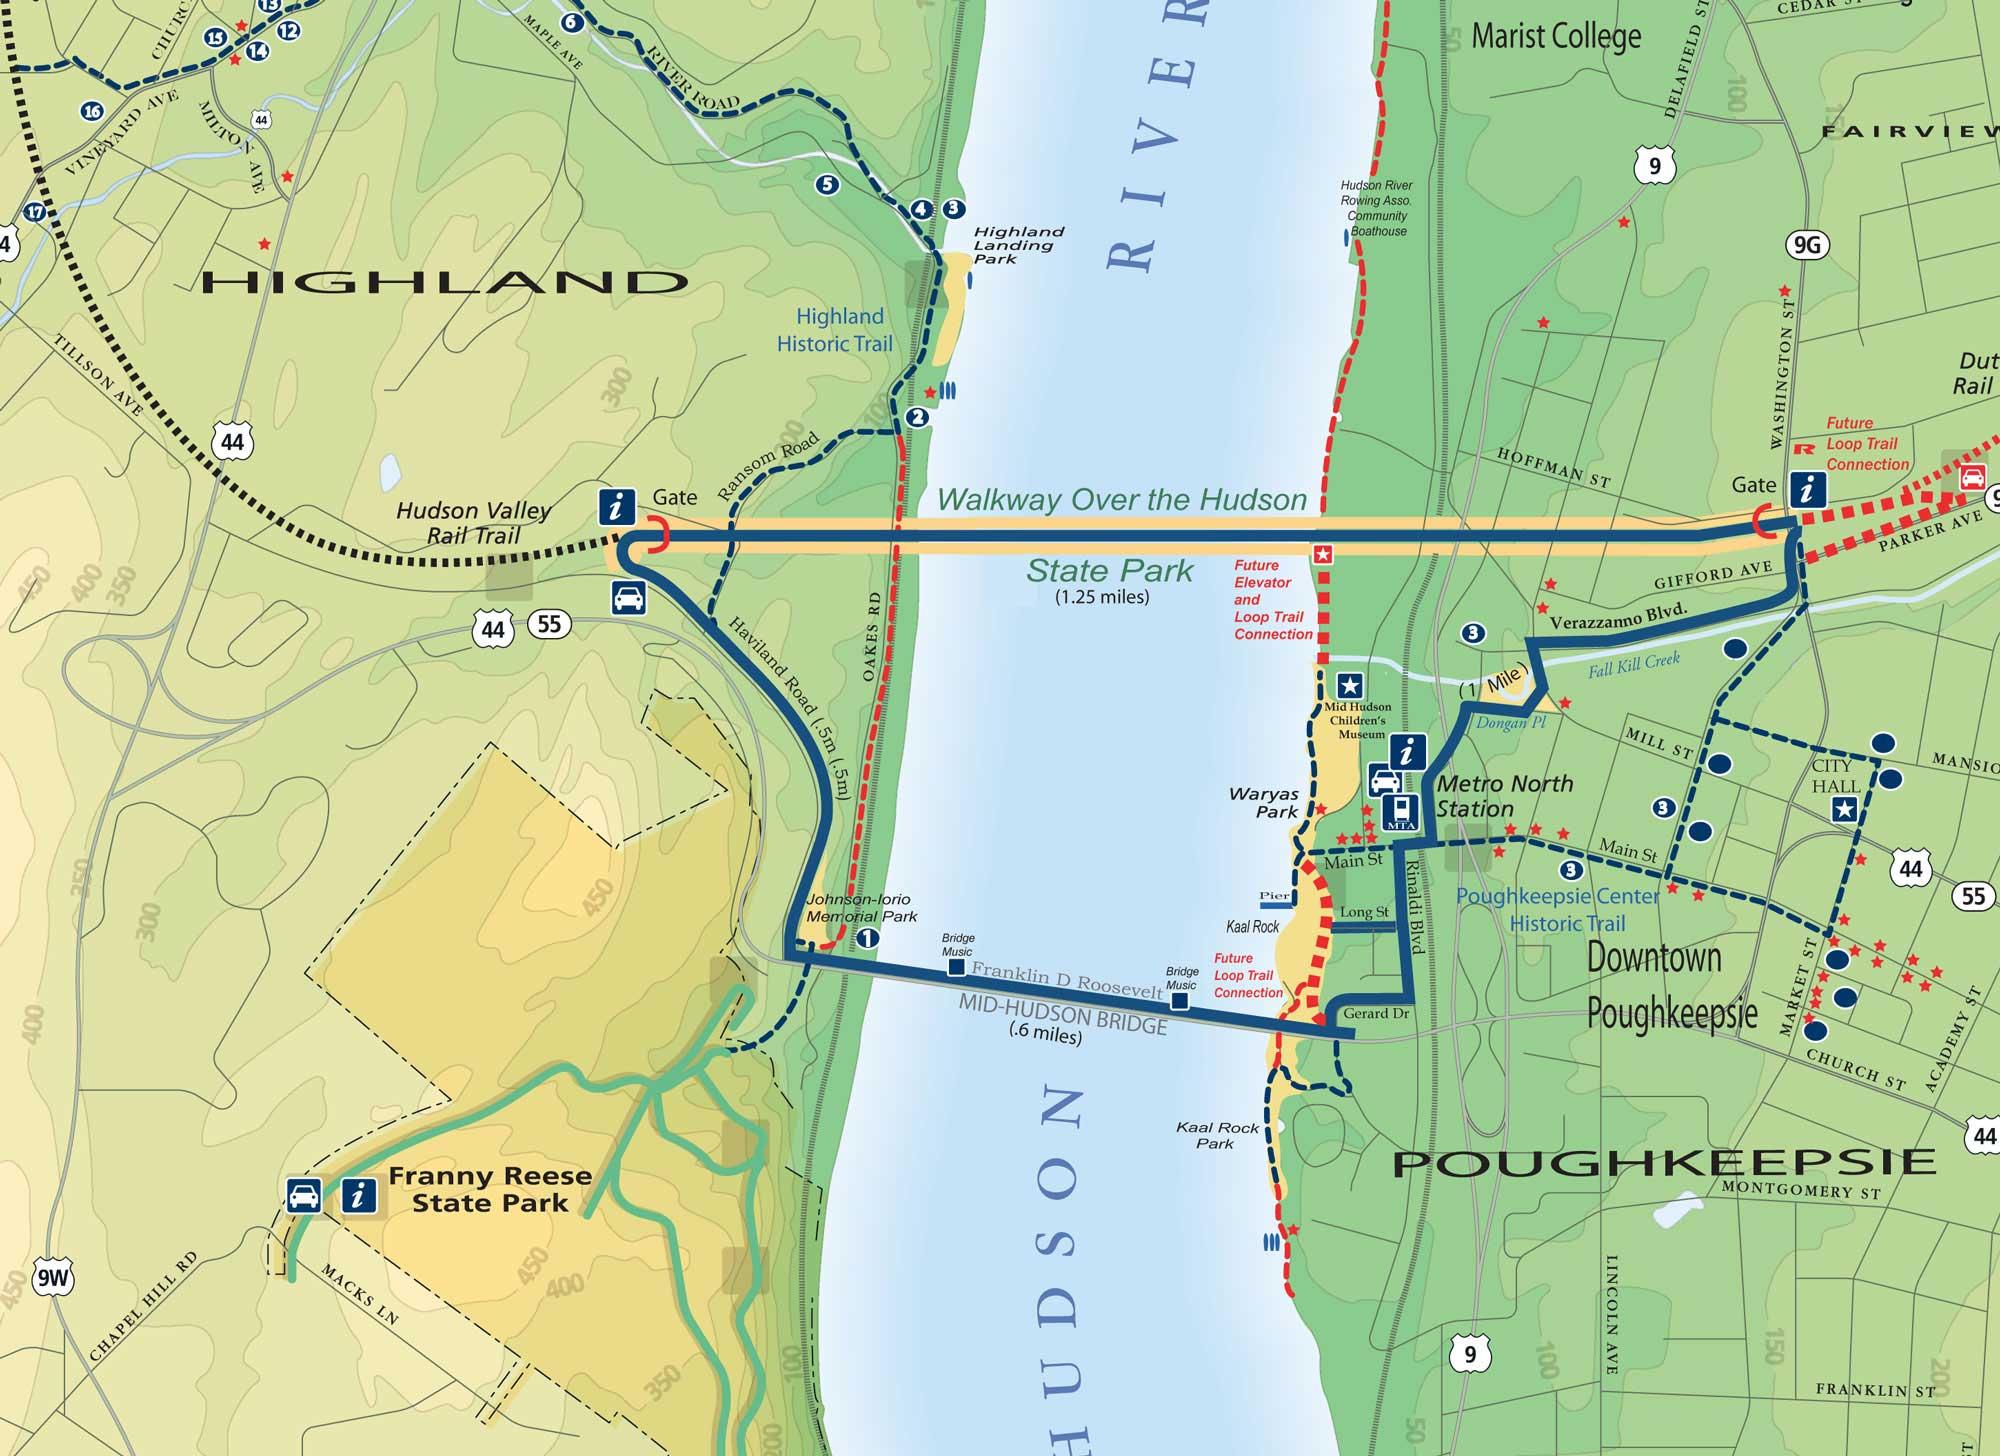 Hudson Valley Rail trail map